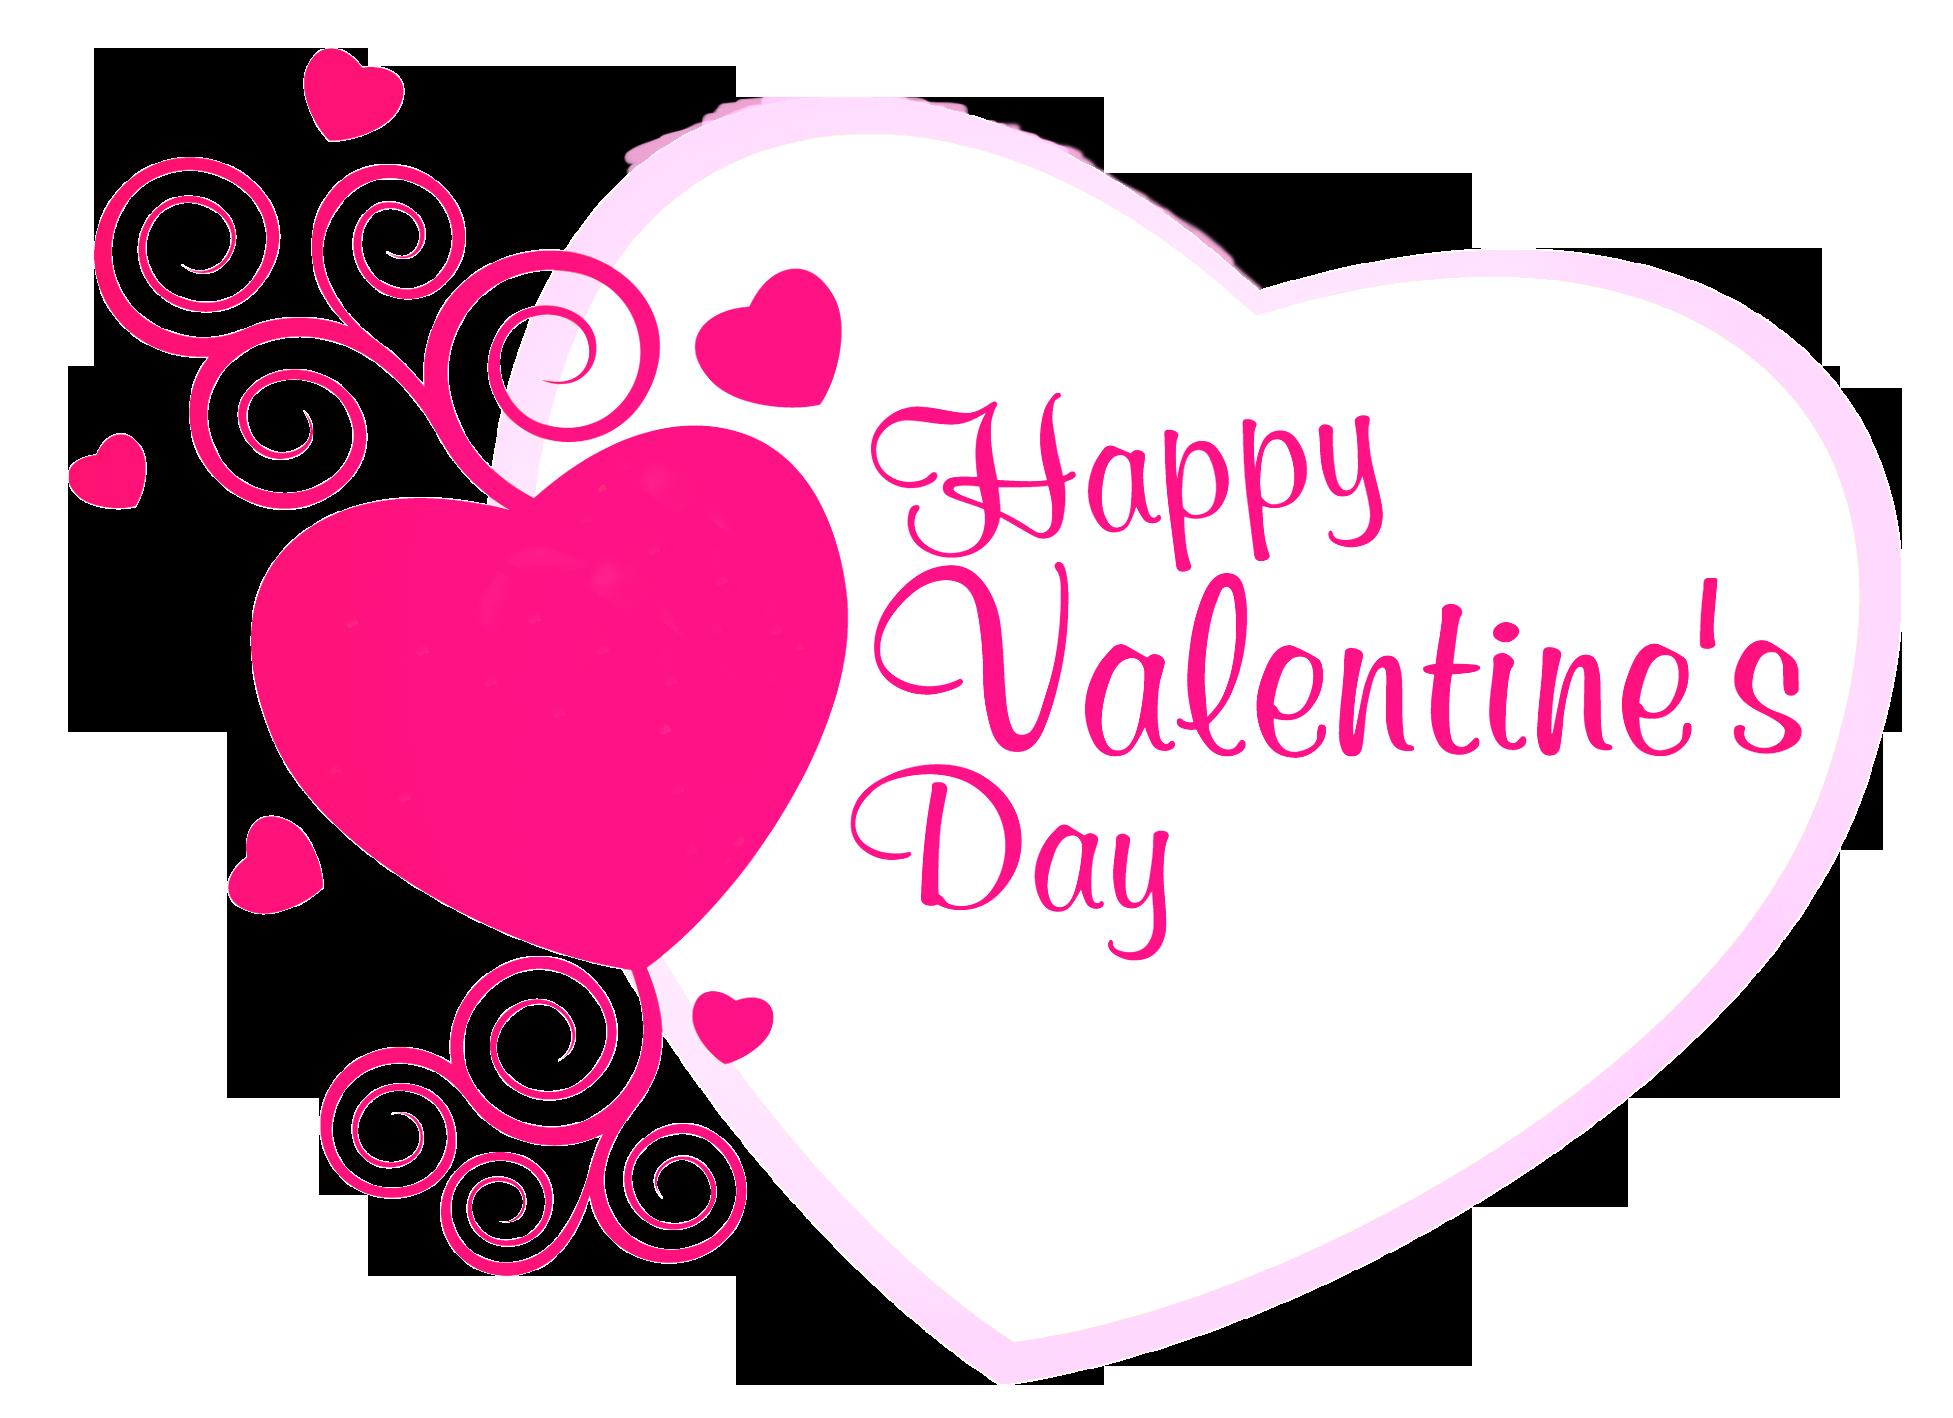 Valentines day hearts happy .